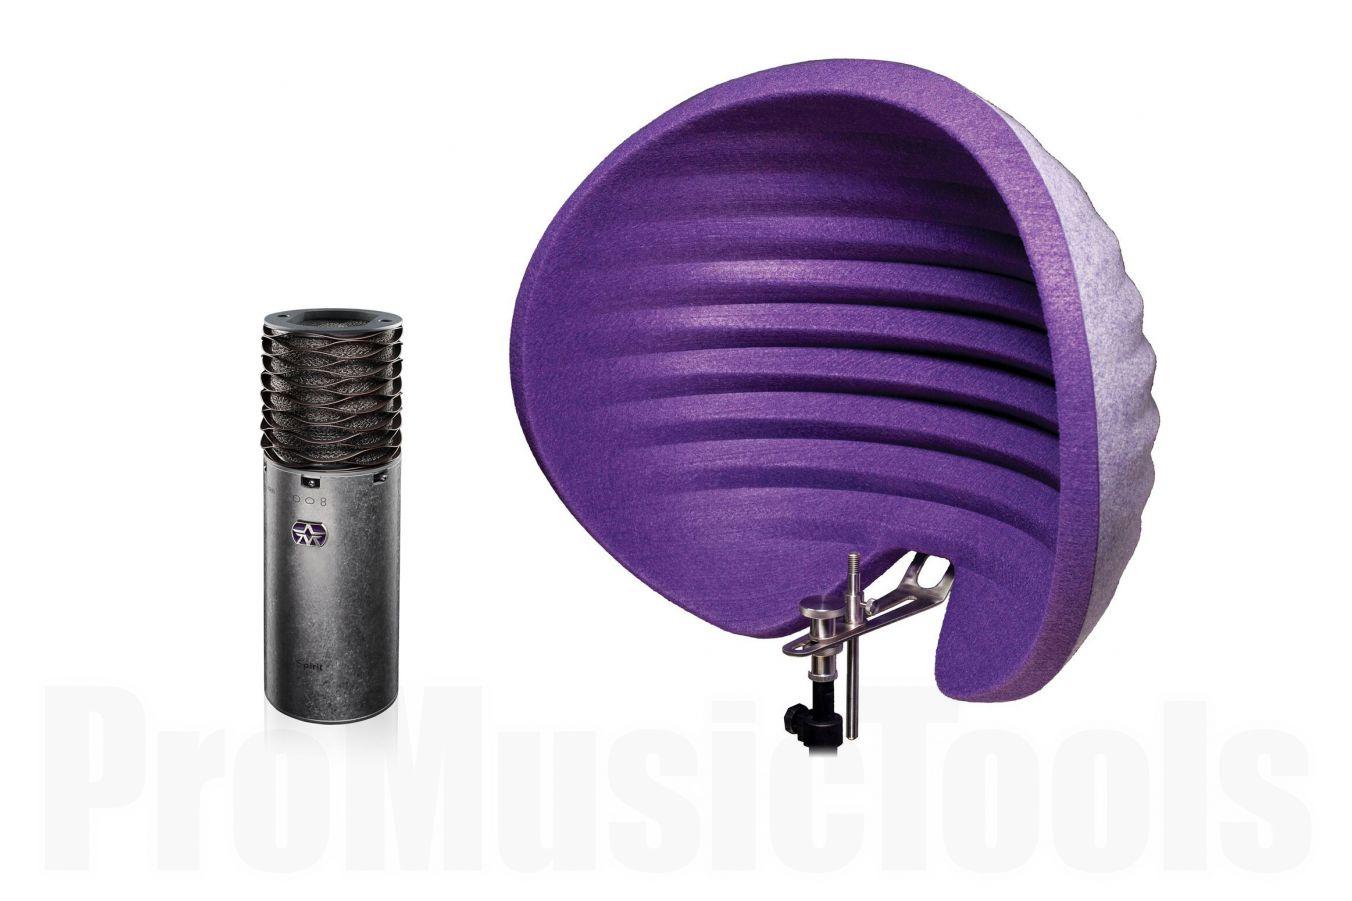 Aston Microphones Spirit & Halo Reflection Filter - Bundle offer